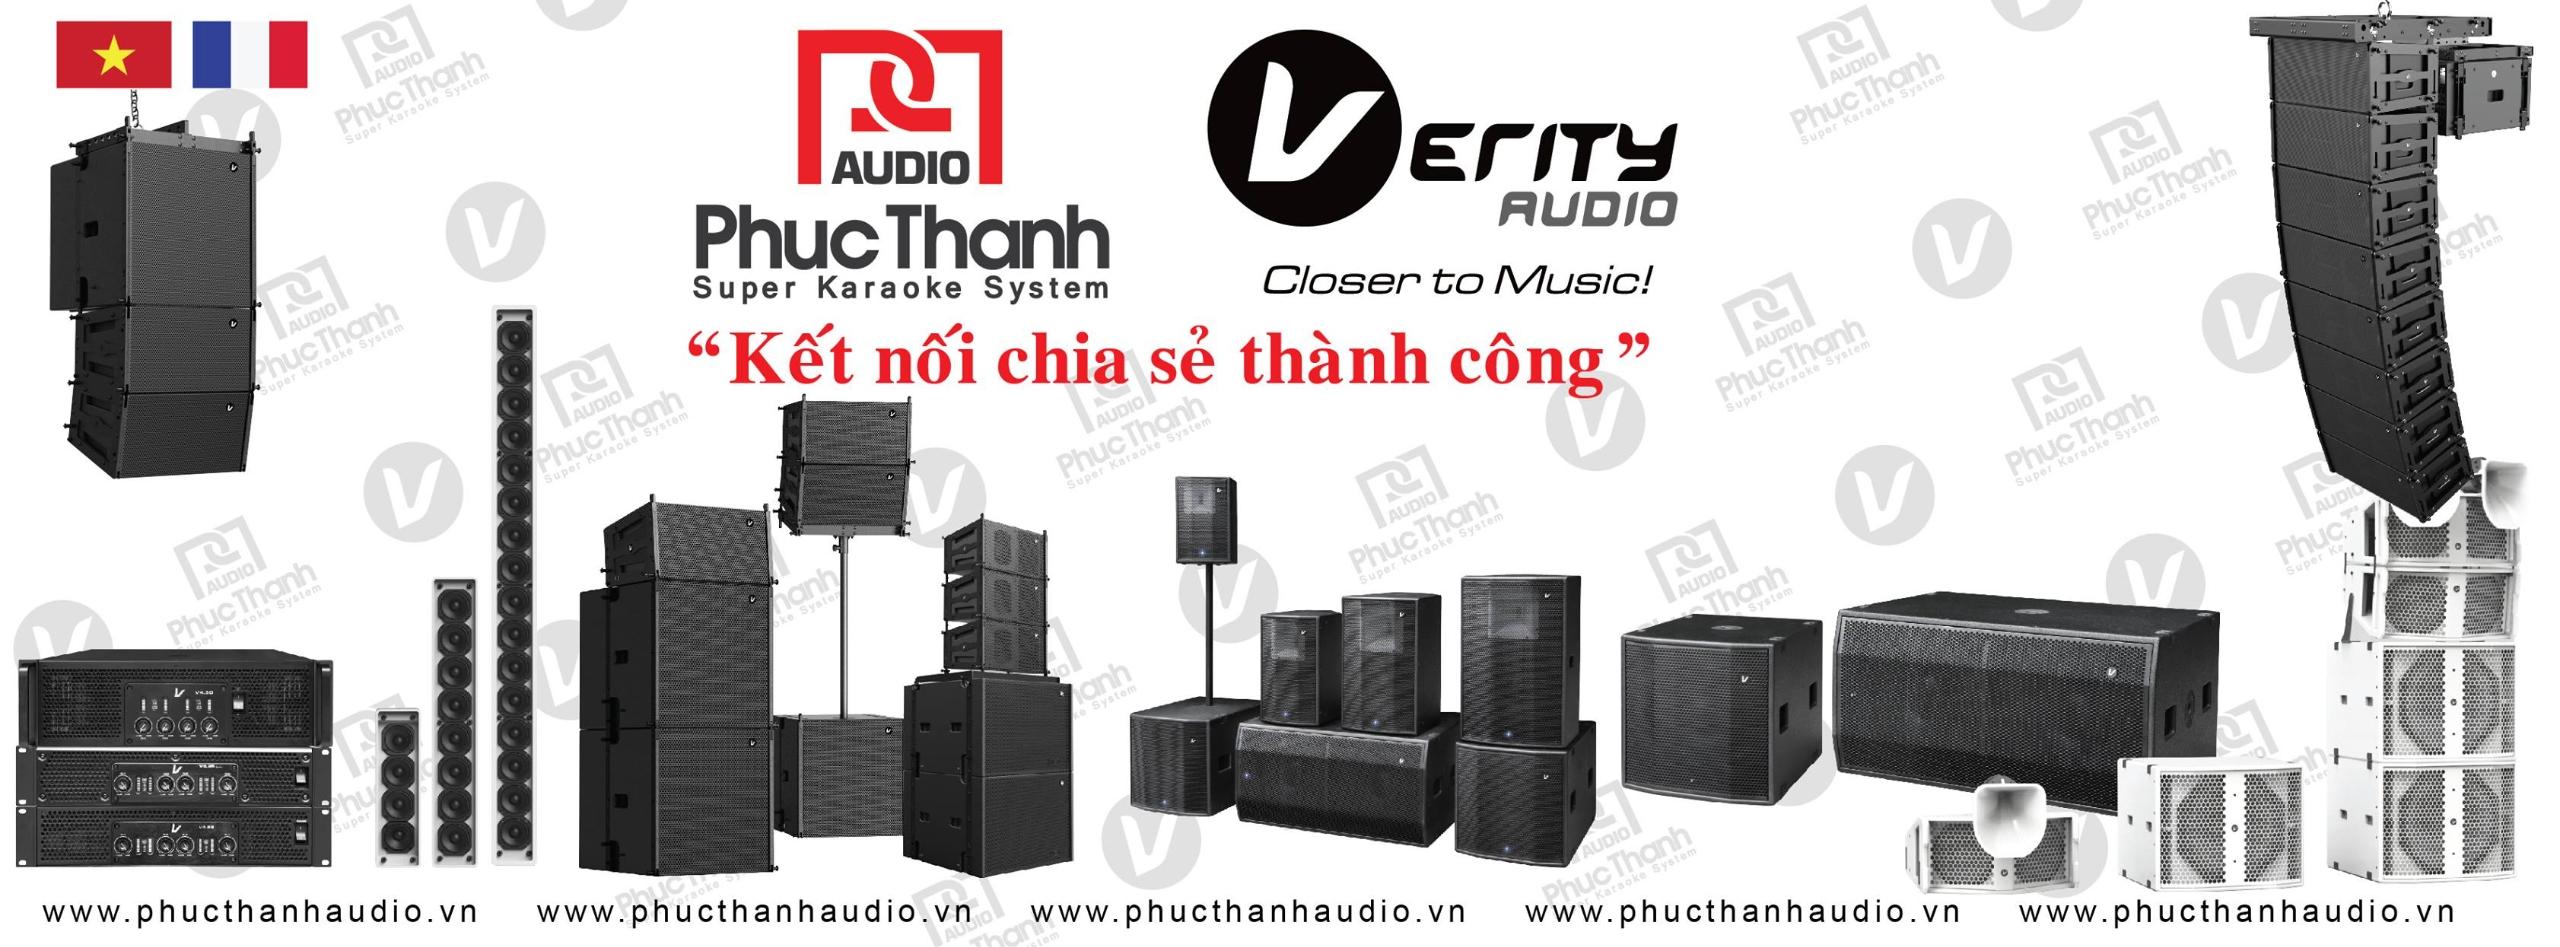 Phúc Thanh Audio (@phucthanhaudio) Cover Image